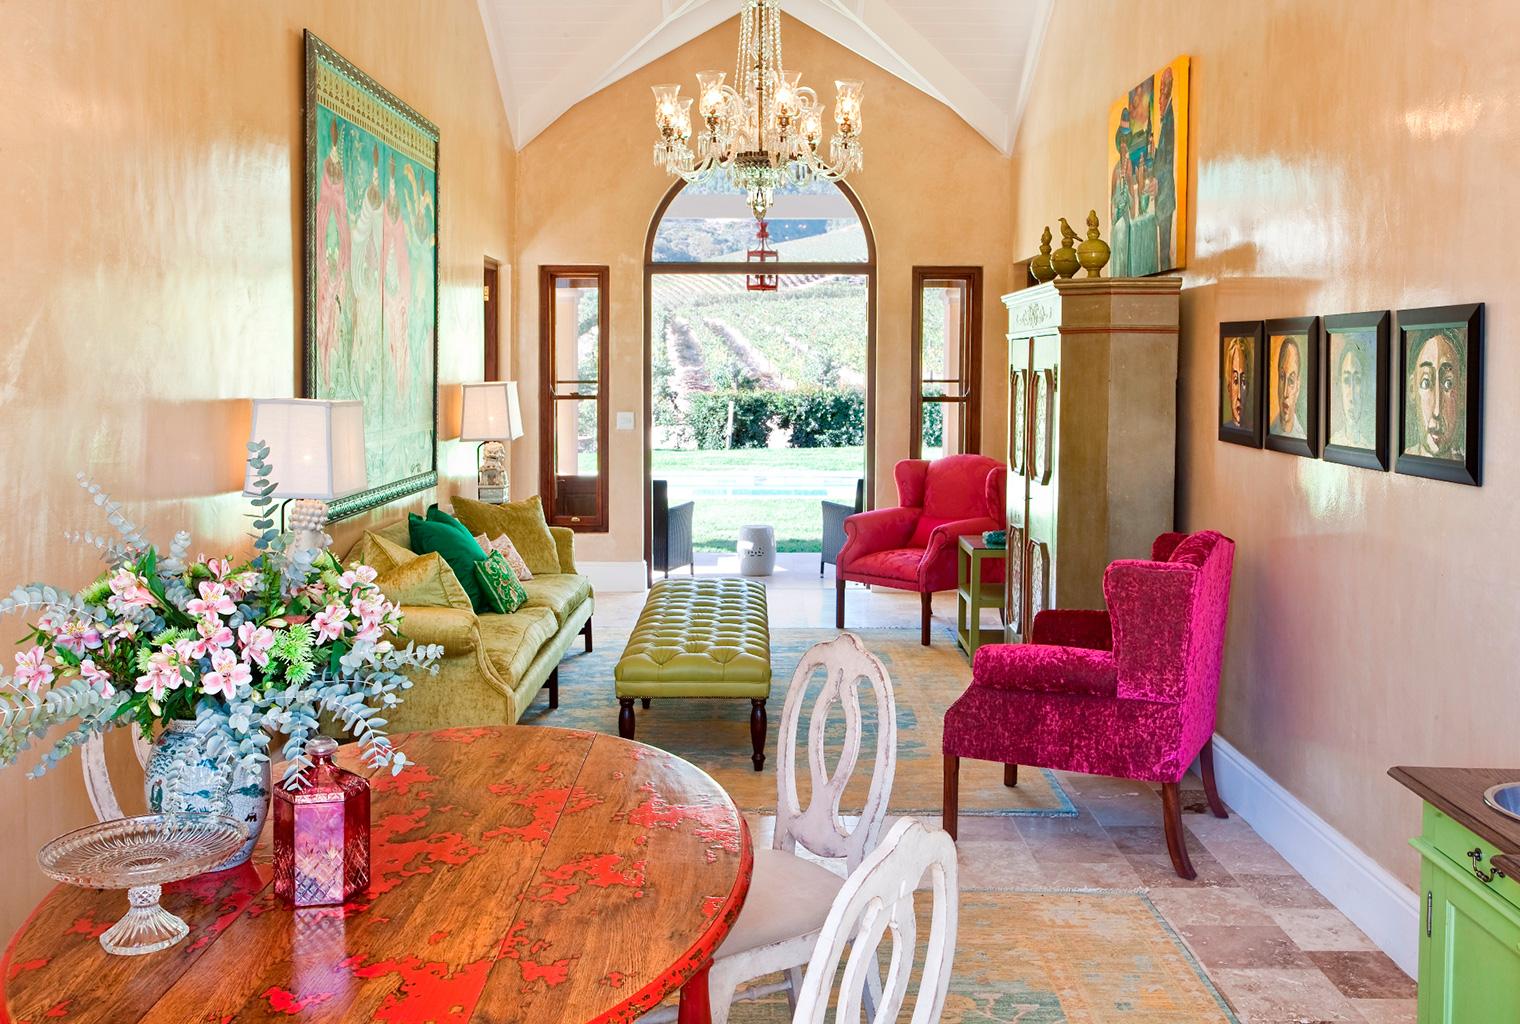 South-Africa, Winelands, La Residence, Lounge